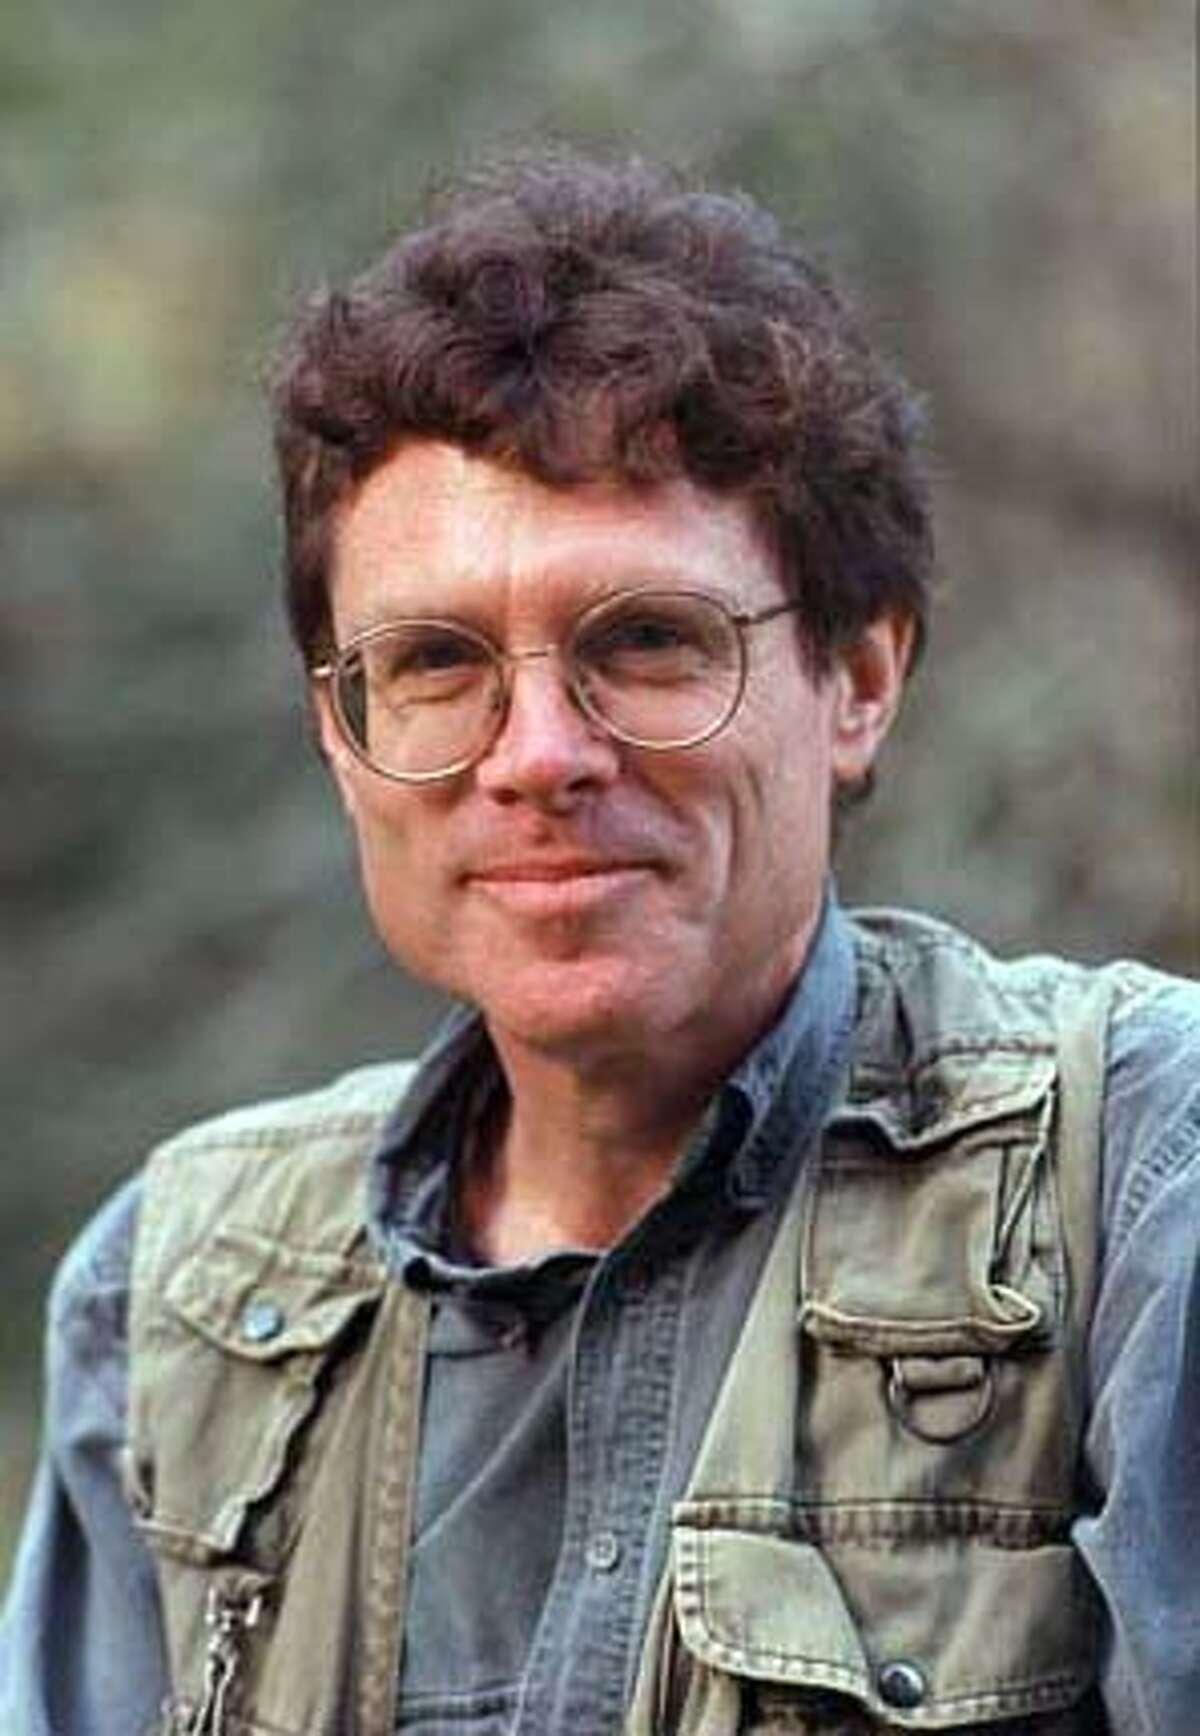 Video journalist James Irwin. (Chronicle photo by Nancy Wong, 2007)